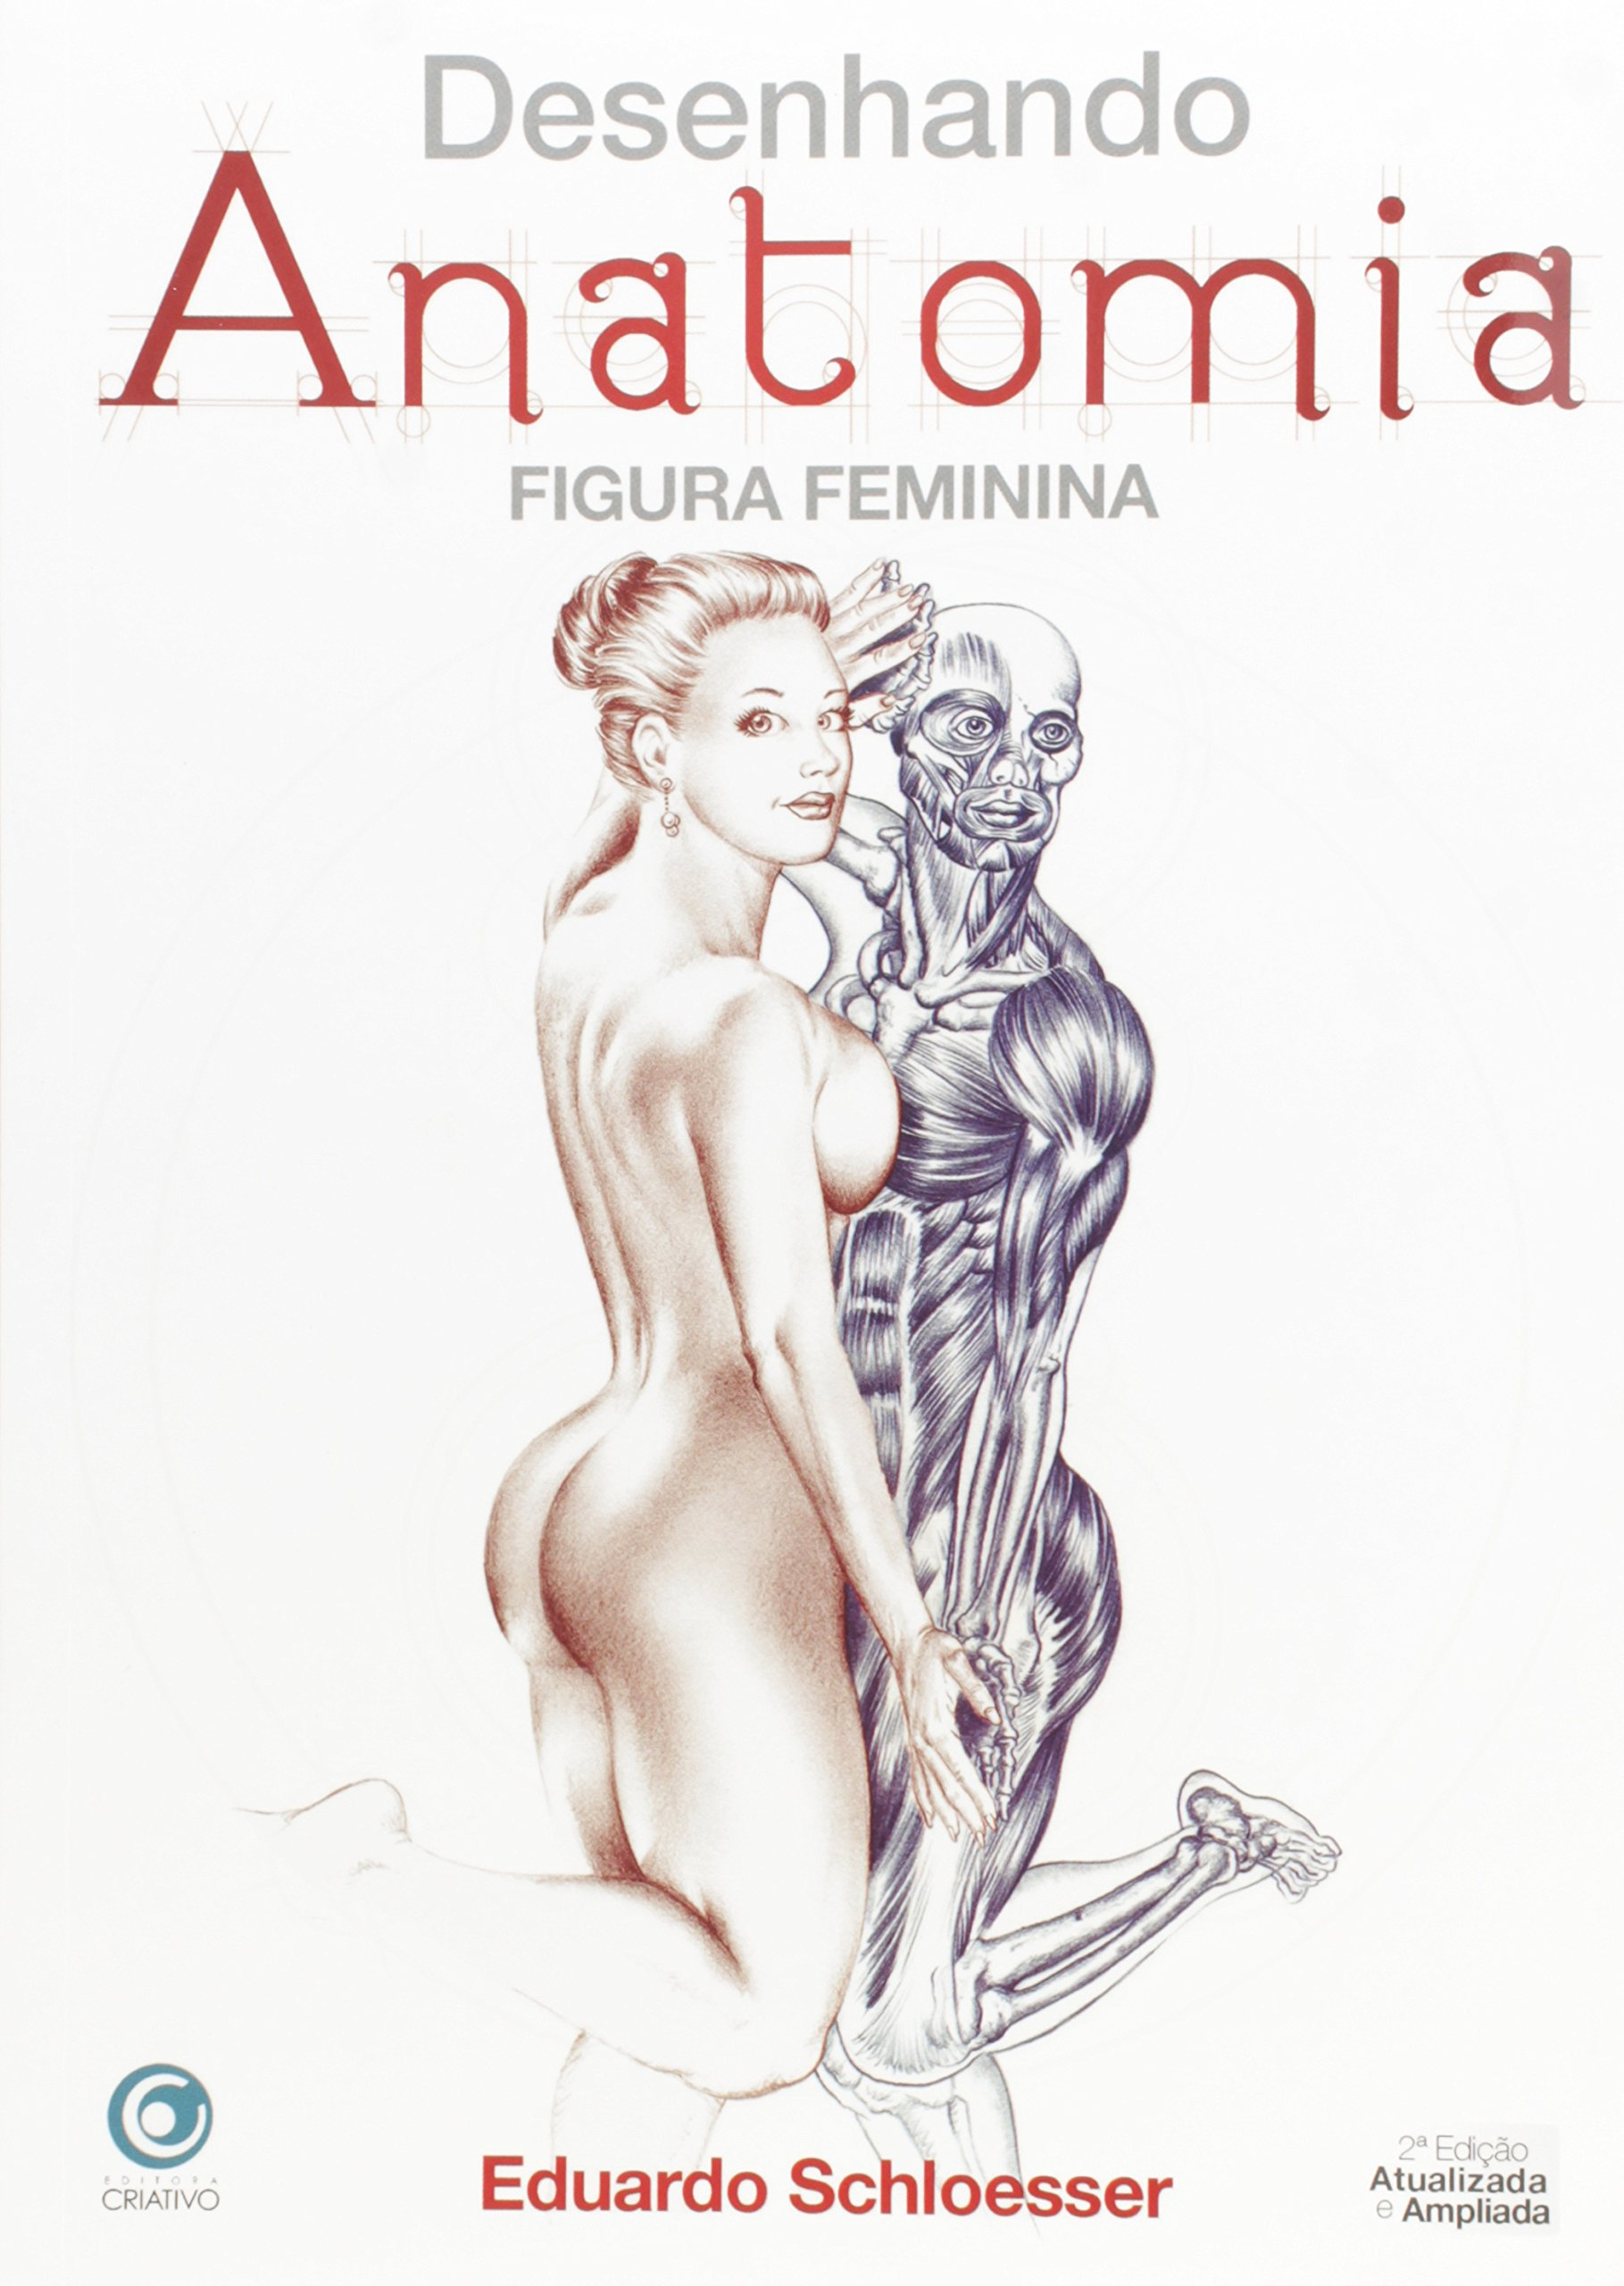 Desenhando Anatomia Figura Feminina Eduardo Schloesser